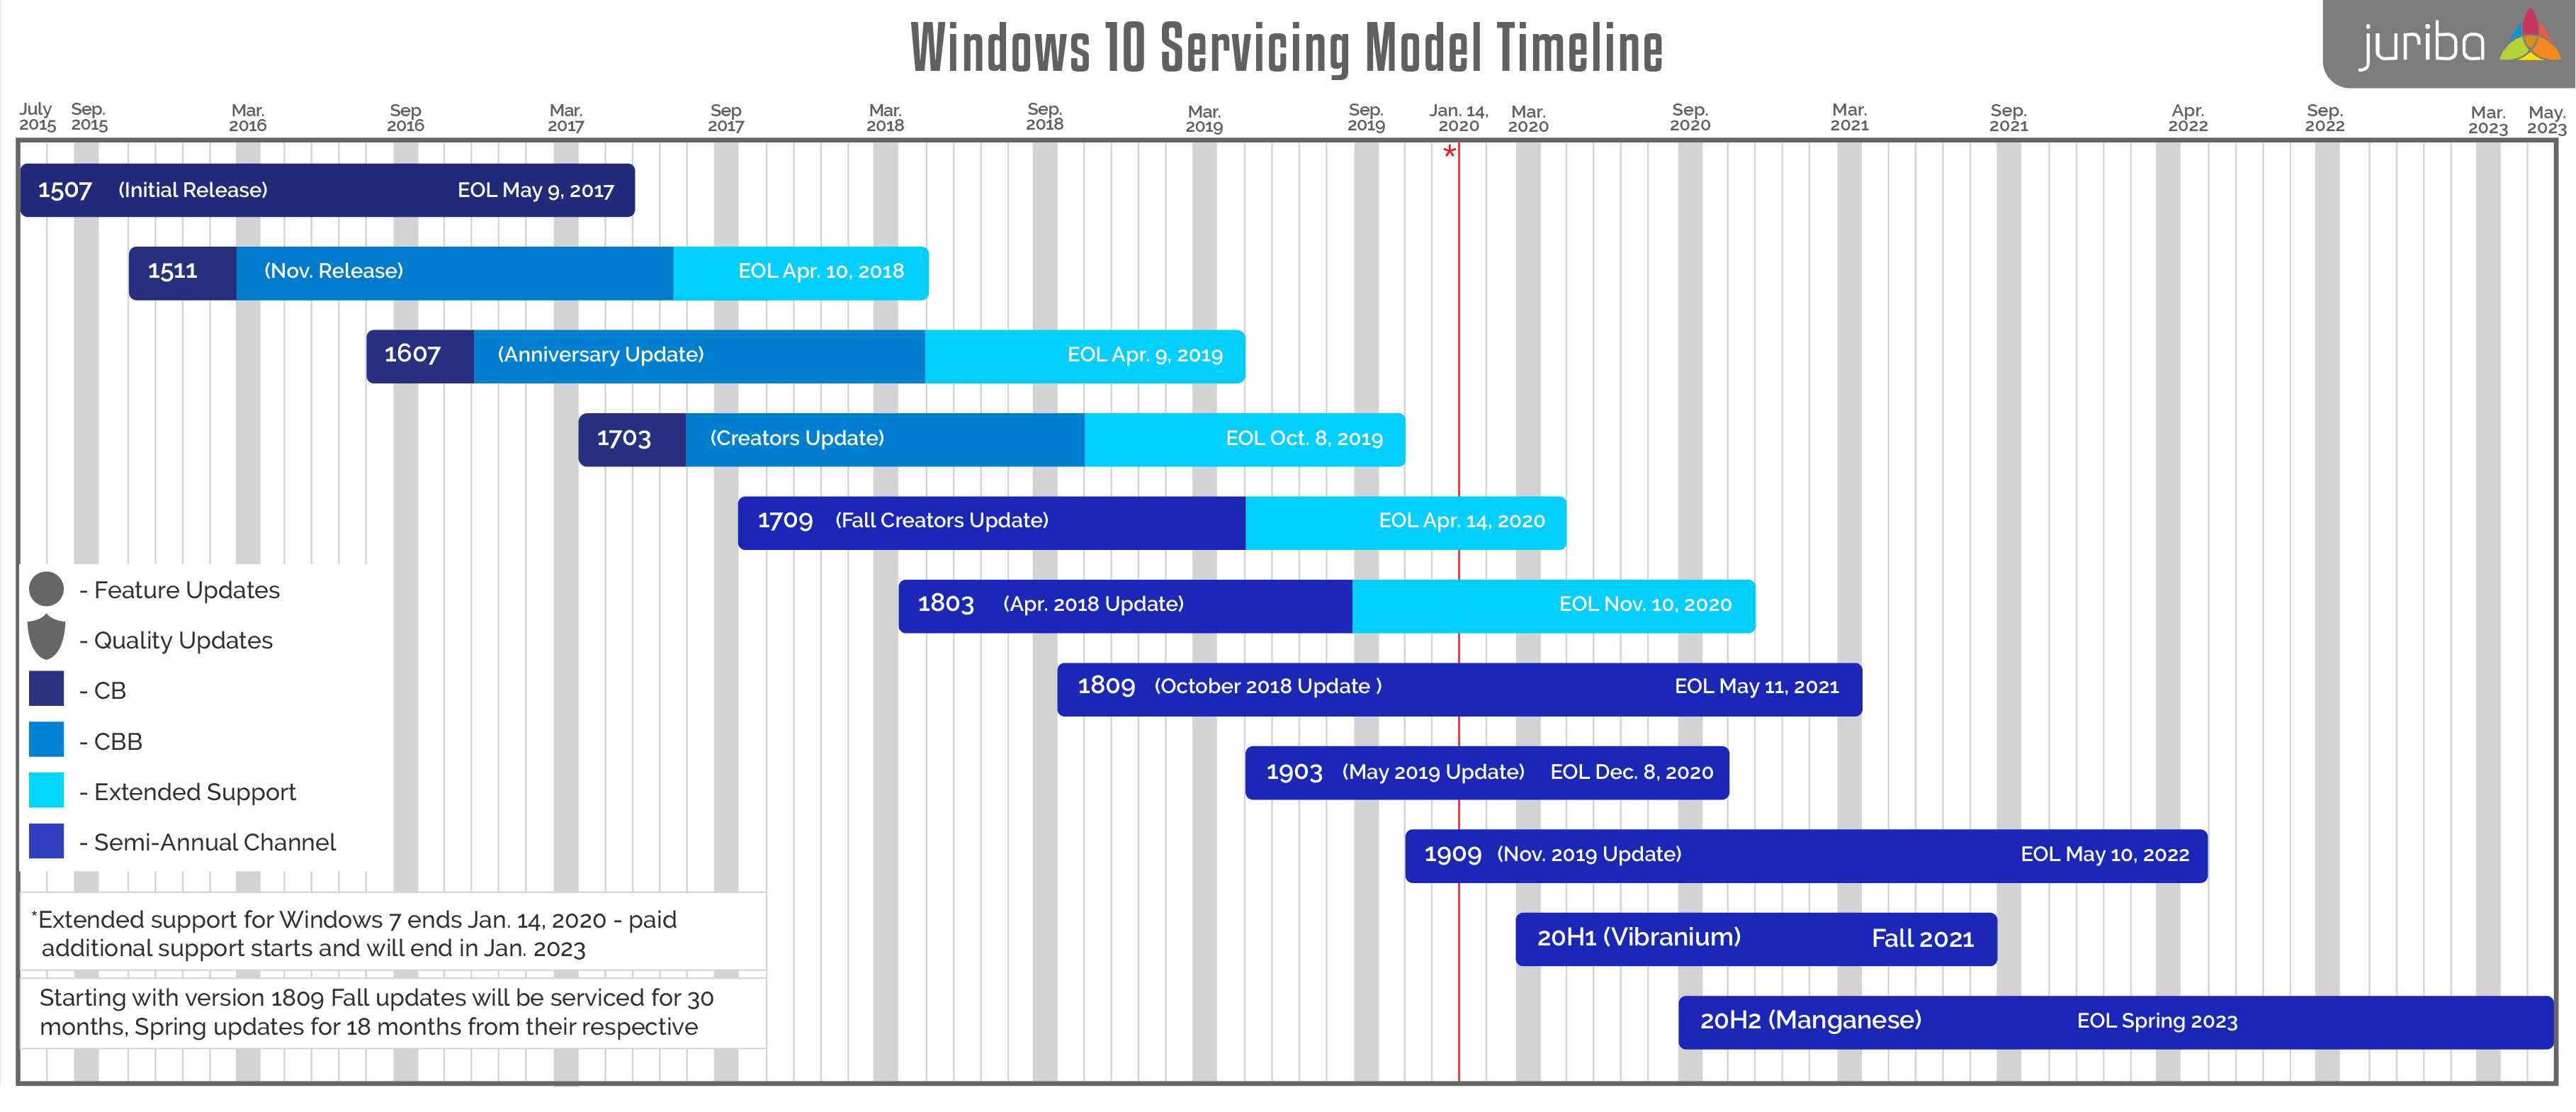 WindowsTimeline012020